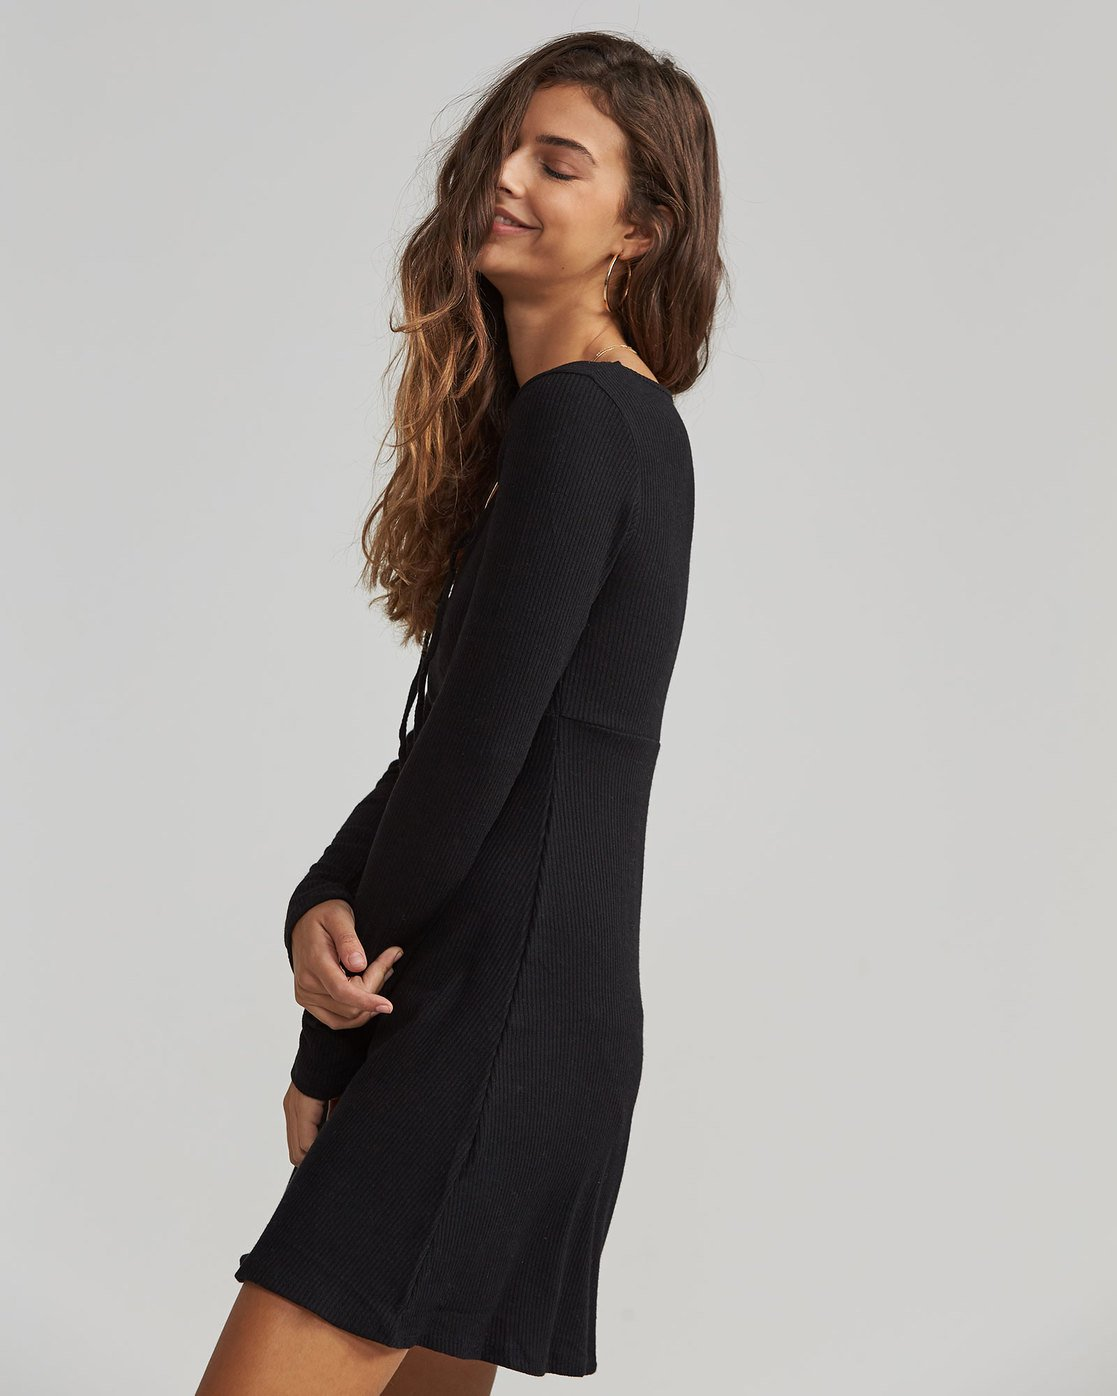 Jd17sbwa Billabong Sleeve Black On Walk Long Sweater Dress 2 4AO08H18